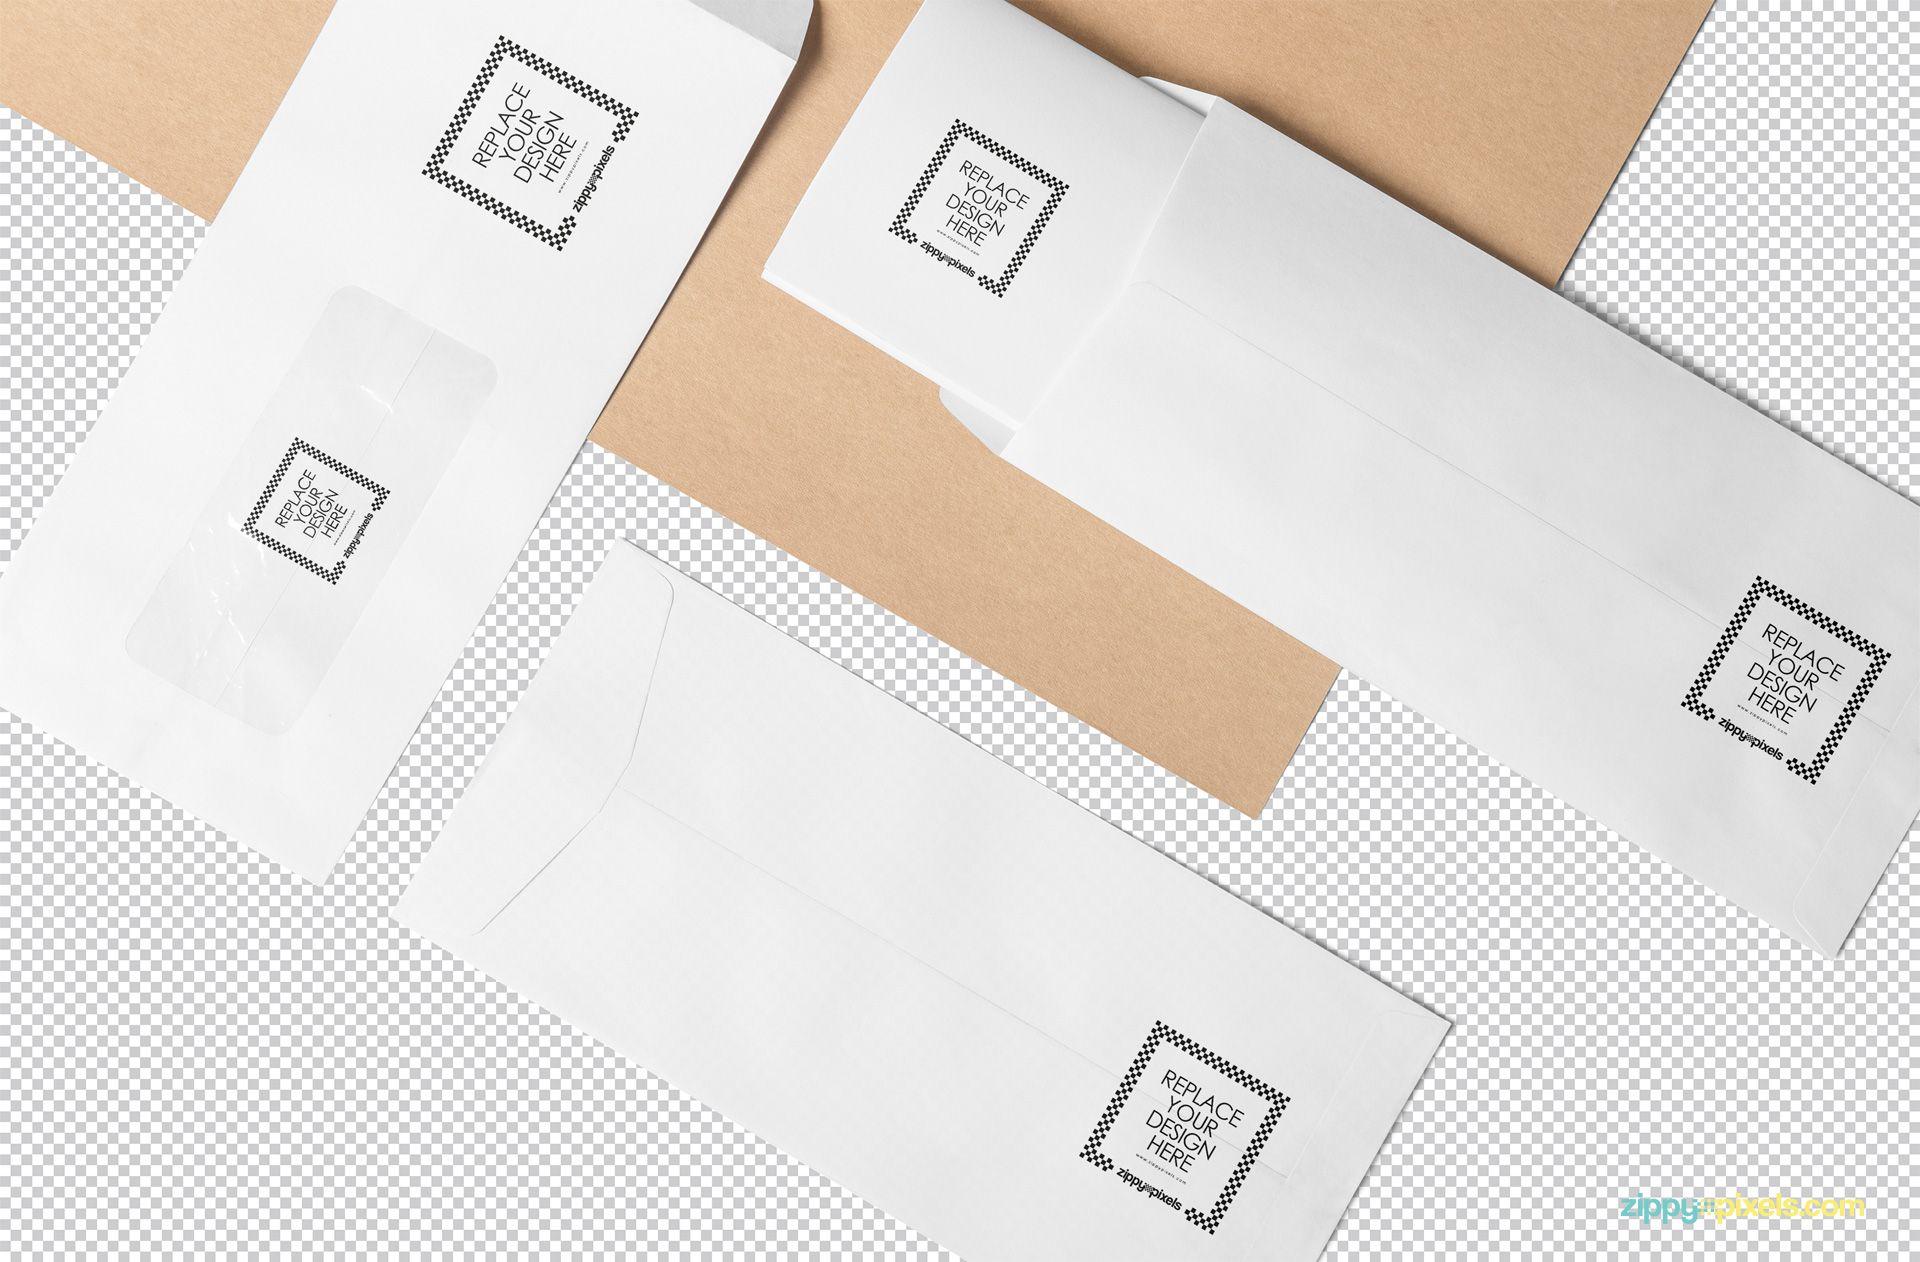 Envelope Mockup PSD Free | ZippyPixels